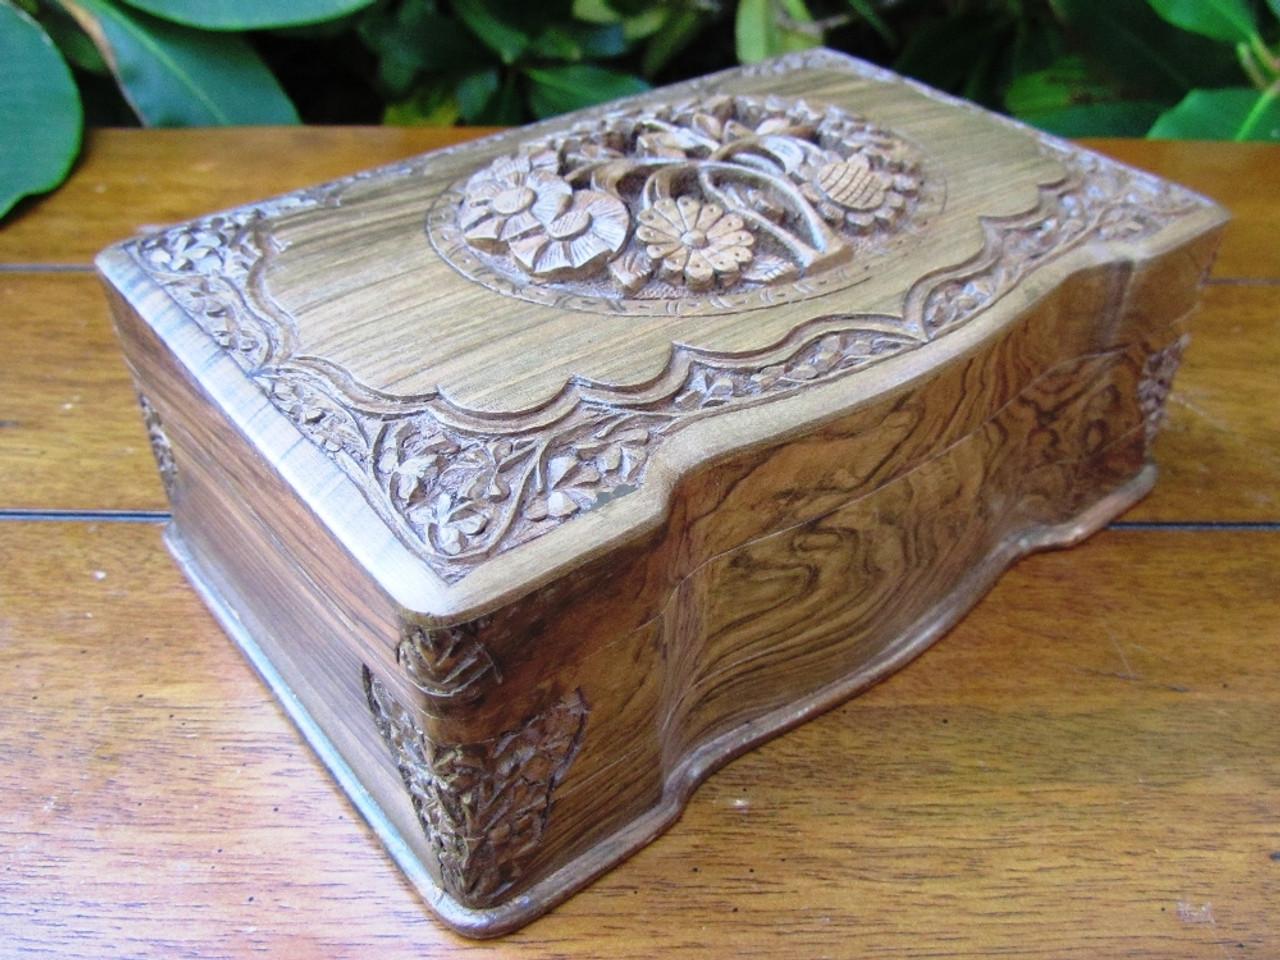 Handcrafted Jewelry Box - Unique Gift Idea